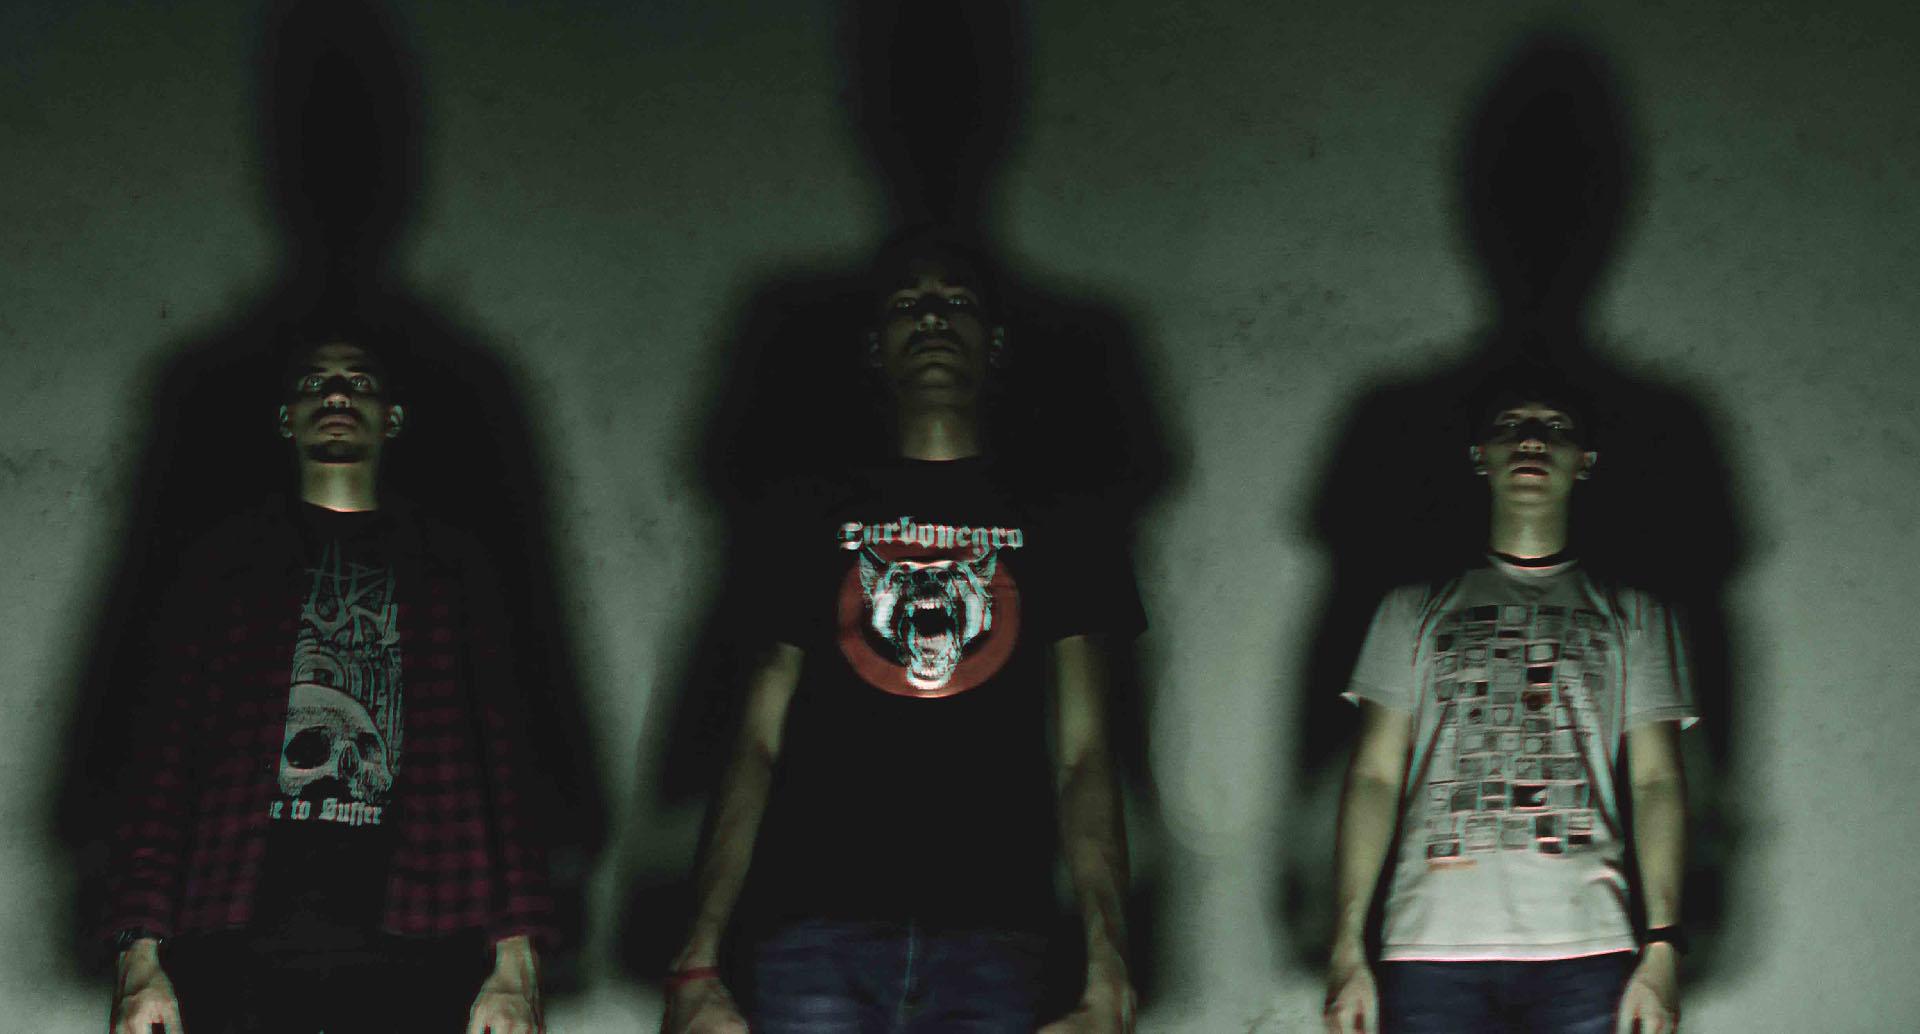 Singapore's Death/Slugde Trio Axis Mundi Release Debut EP and Music Video